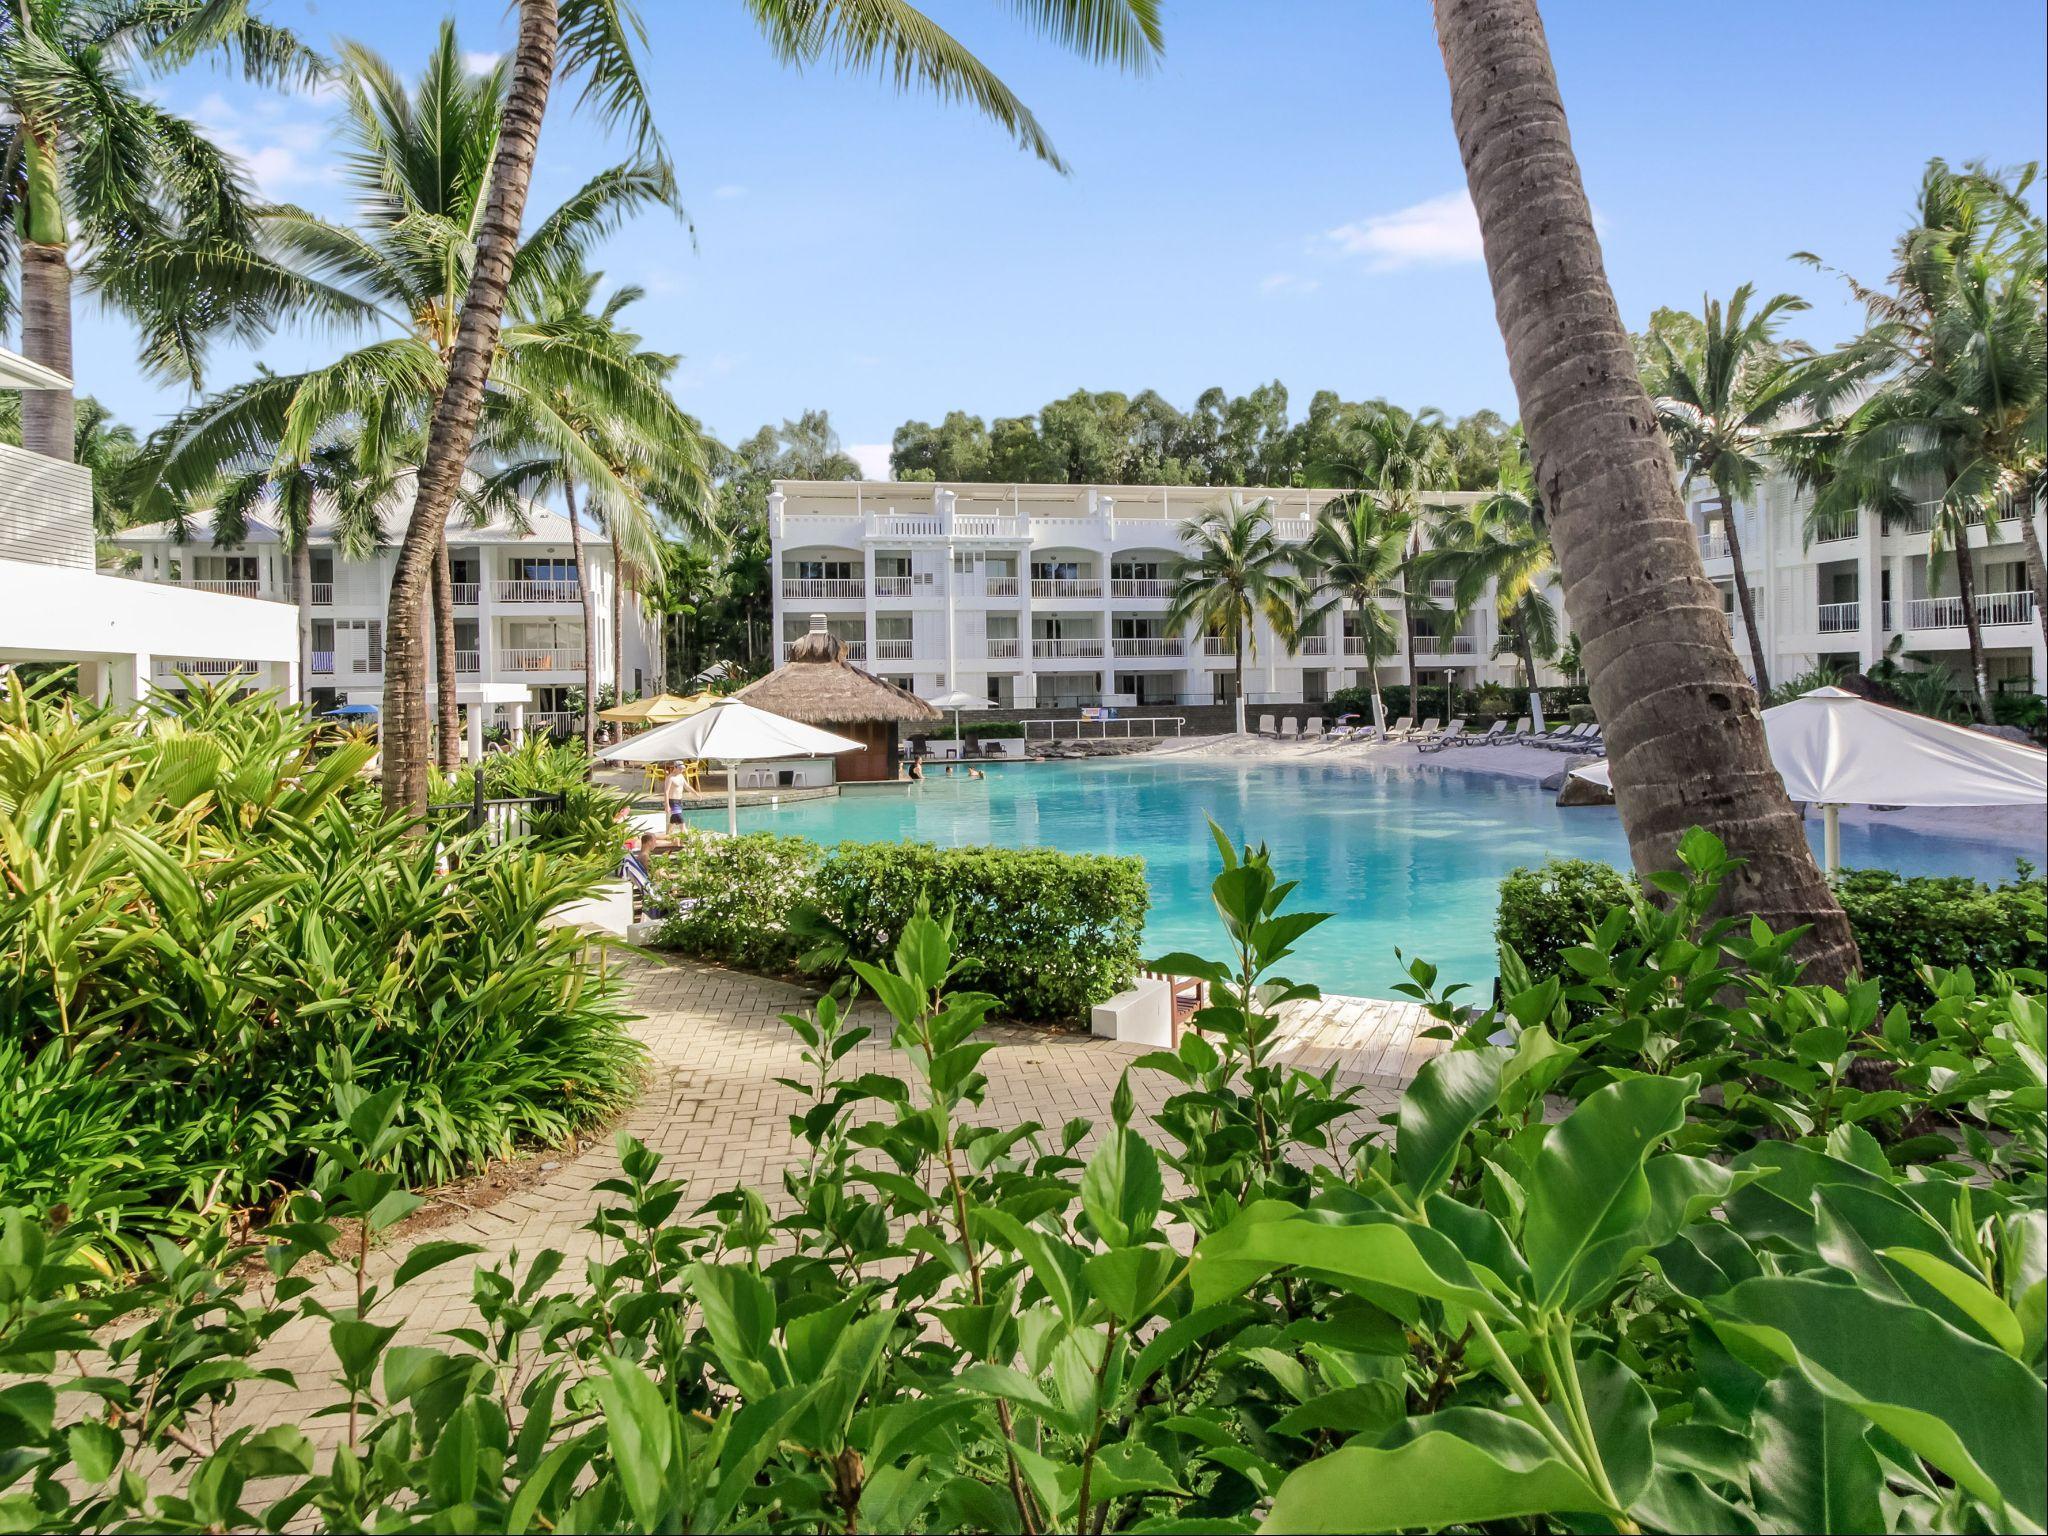 Hilliana   1 Bedroom Apt At Sea Temple Palm Cove